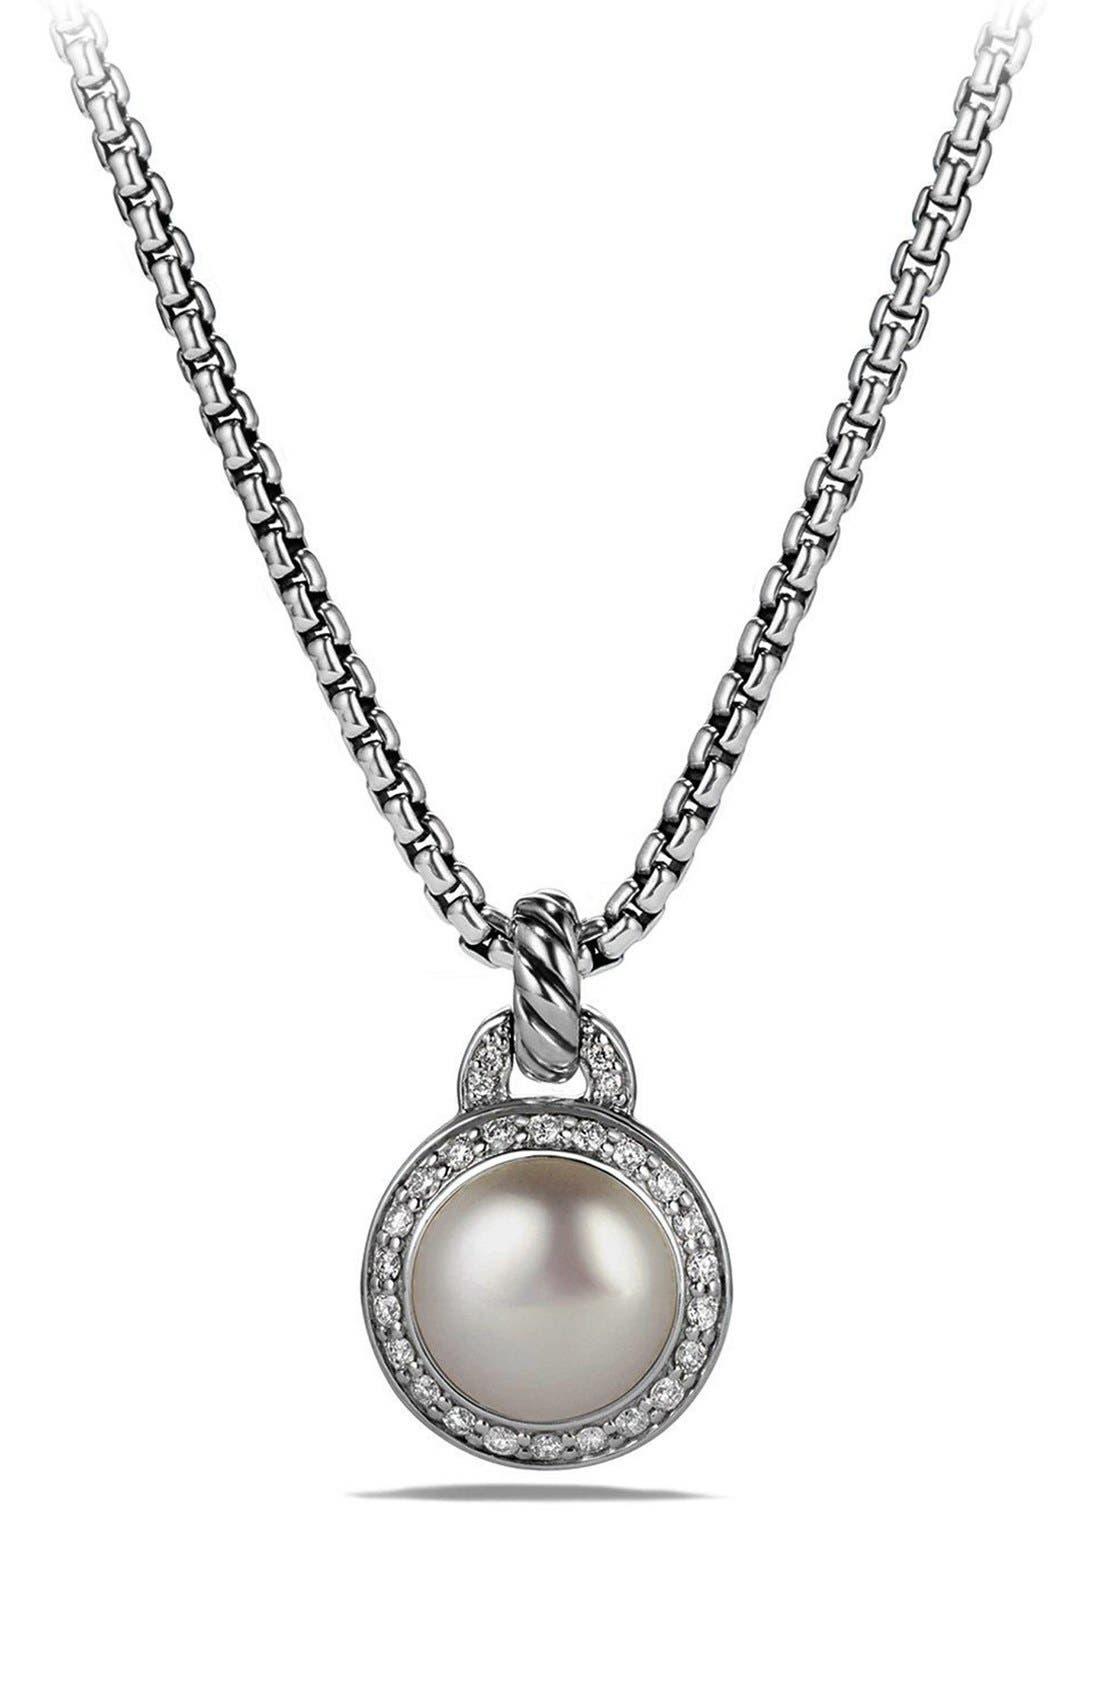 'Cerise' Petite Cerise Pendant Necklace with Pearl and Diamonds,                         Main,                         color, Silver/ Pearl